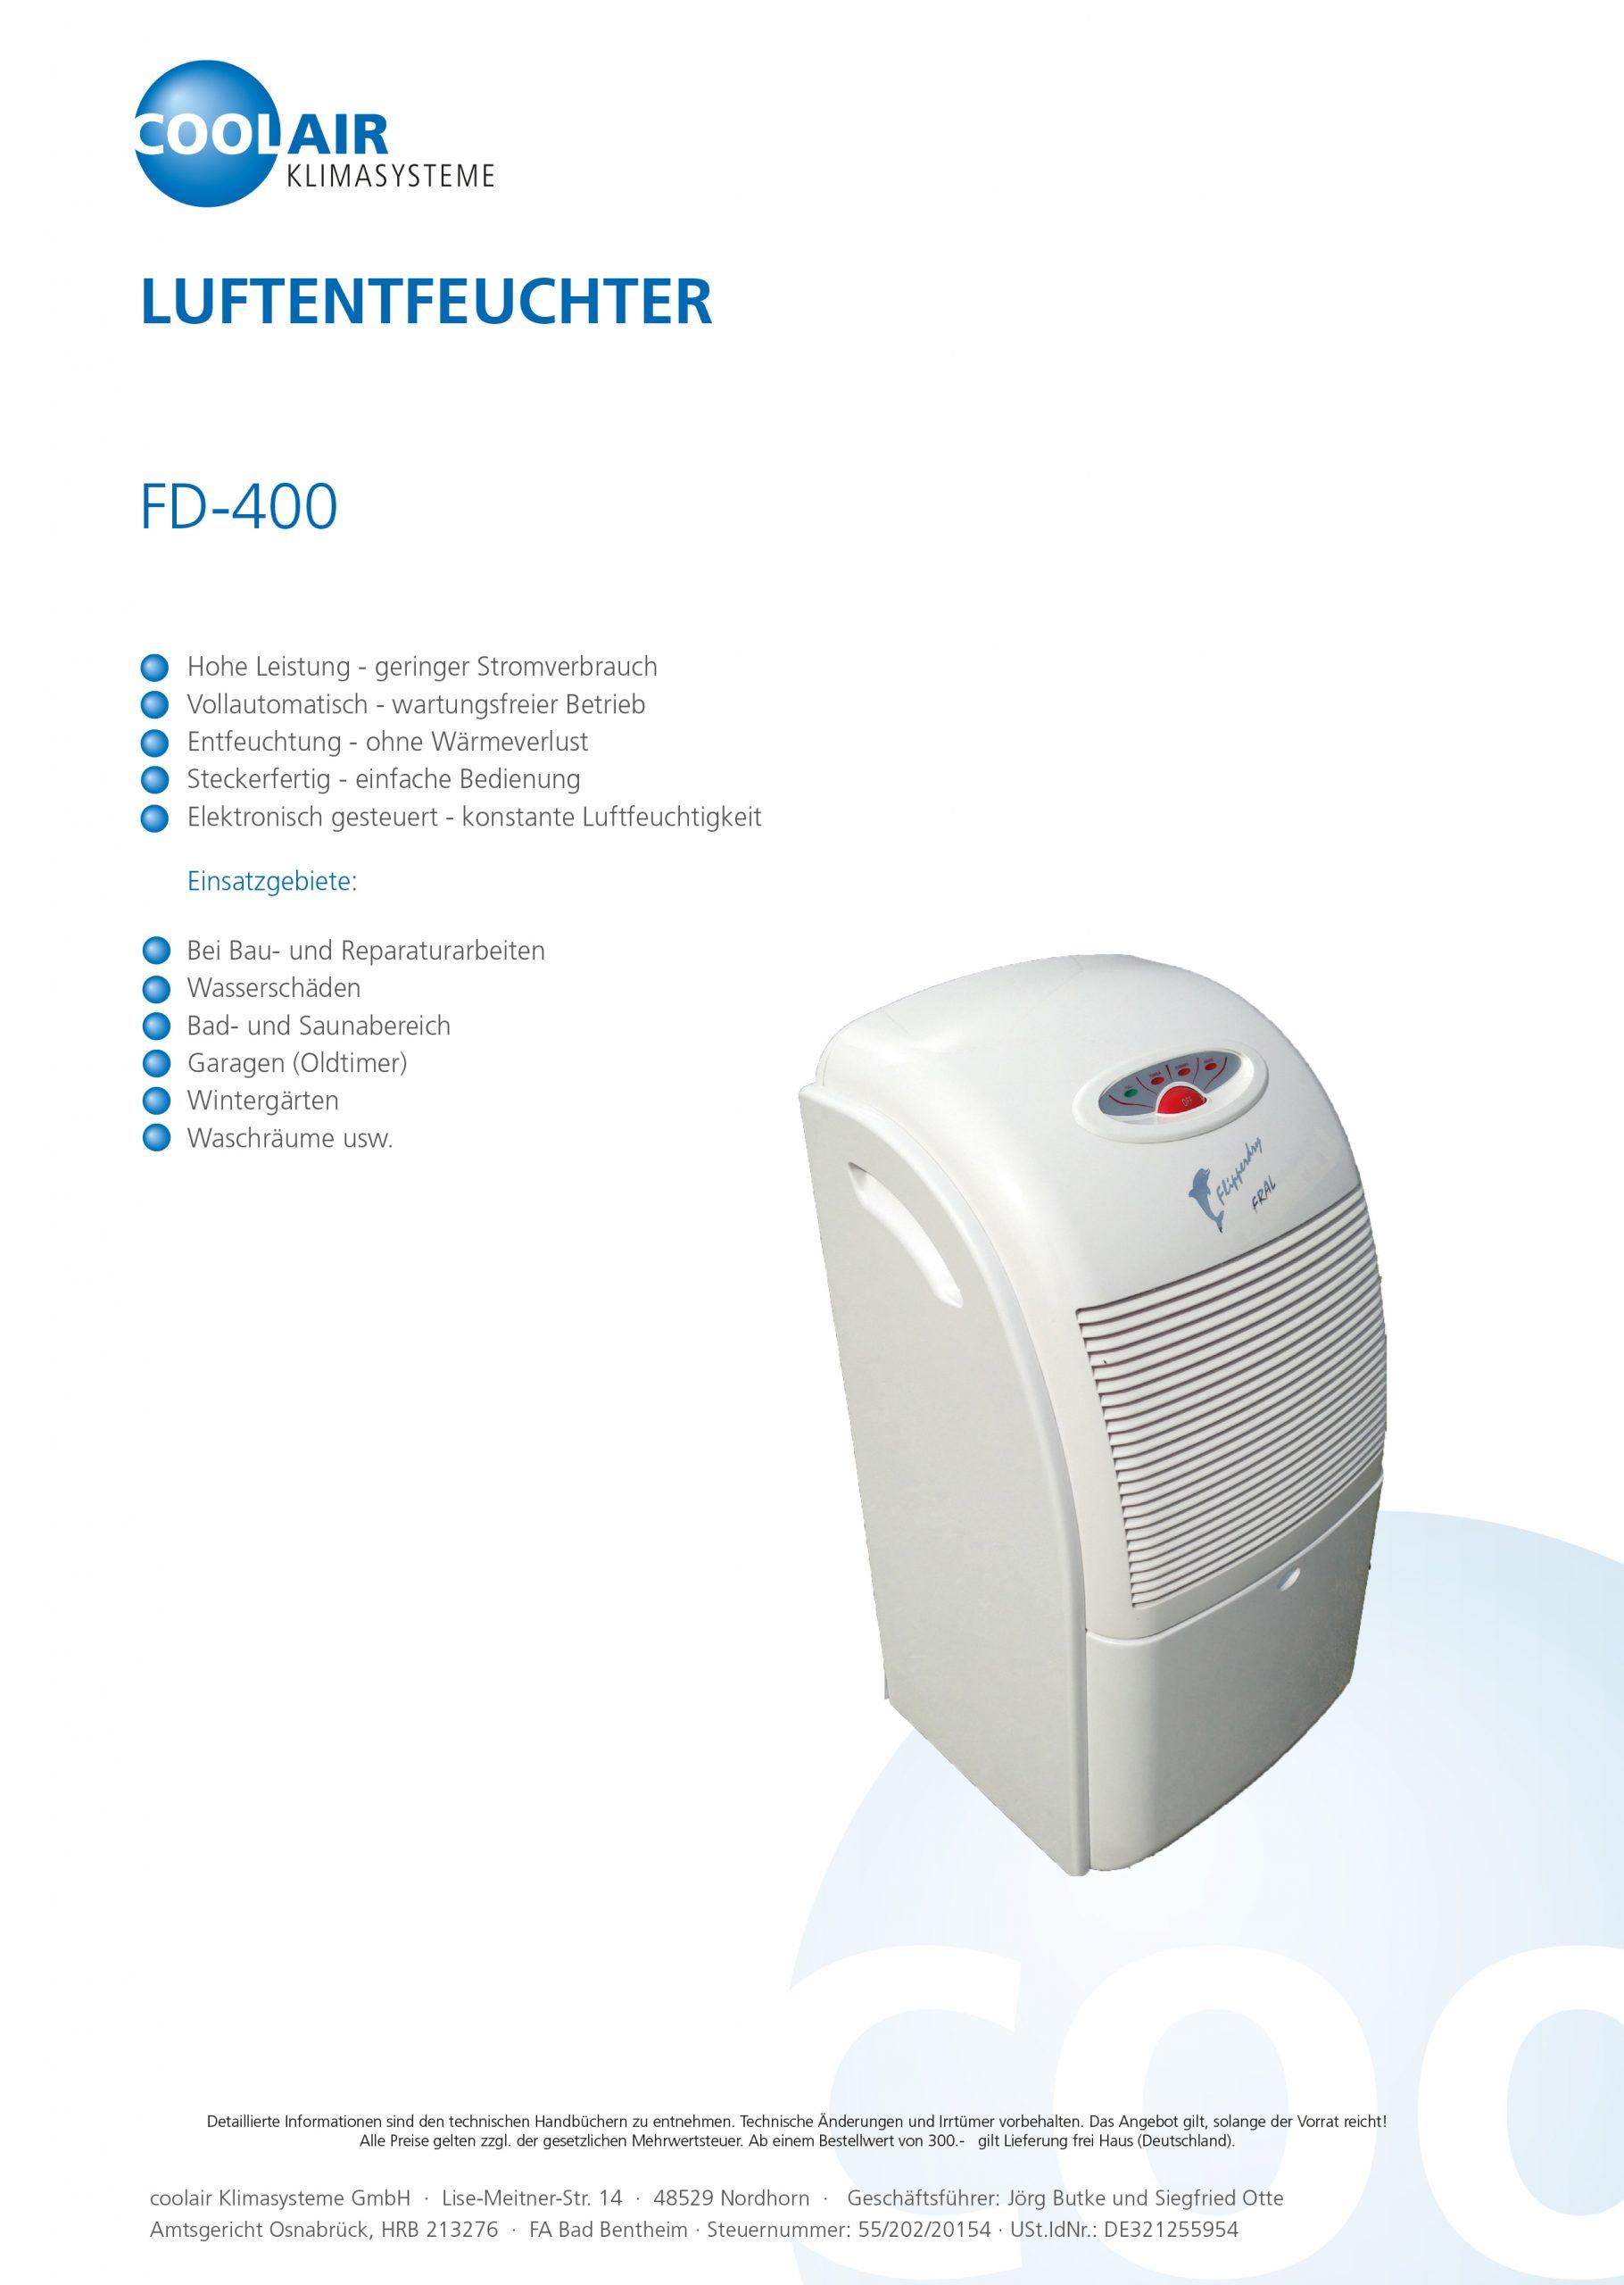 Luftentfeuchter FD 400